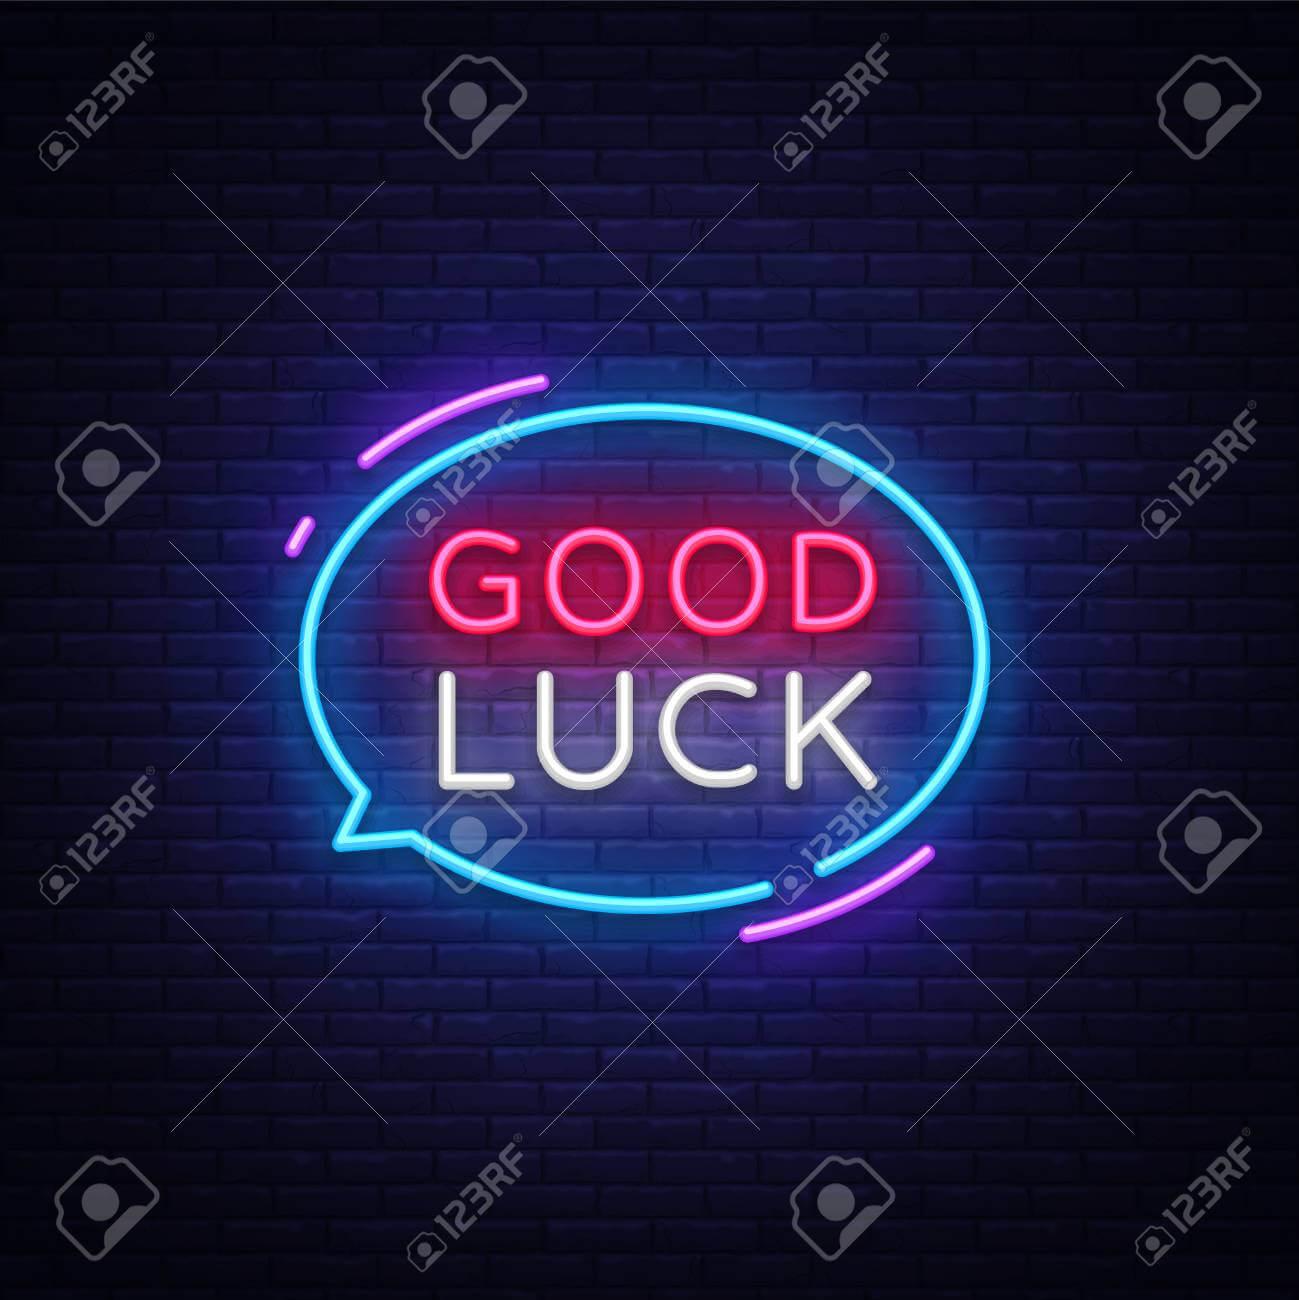 Good Luck Neon Text Vector. Good Luck Neon Sign, Design Template,.. With Good Luck Banner Template